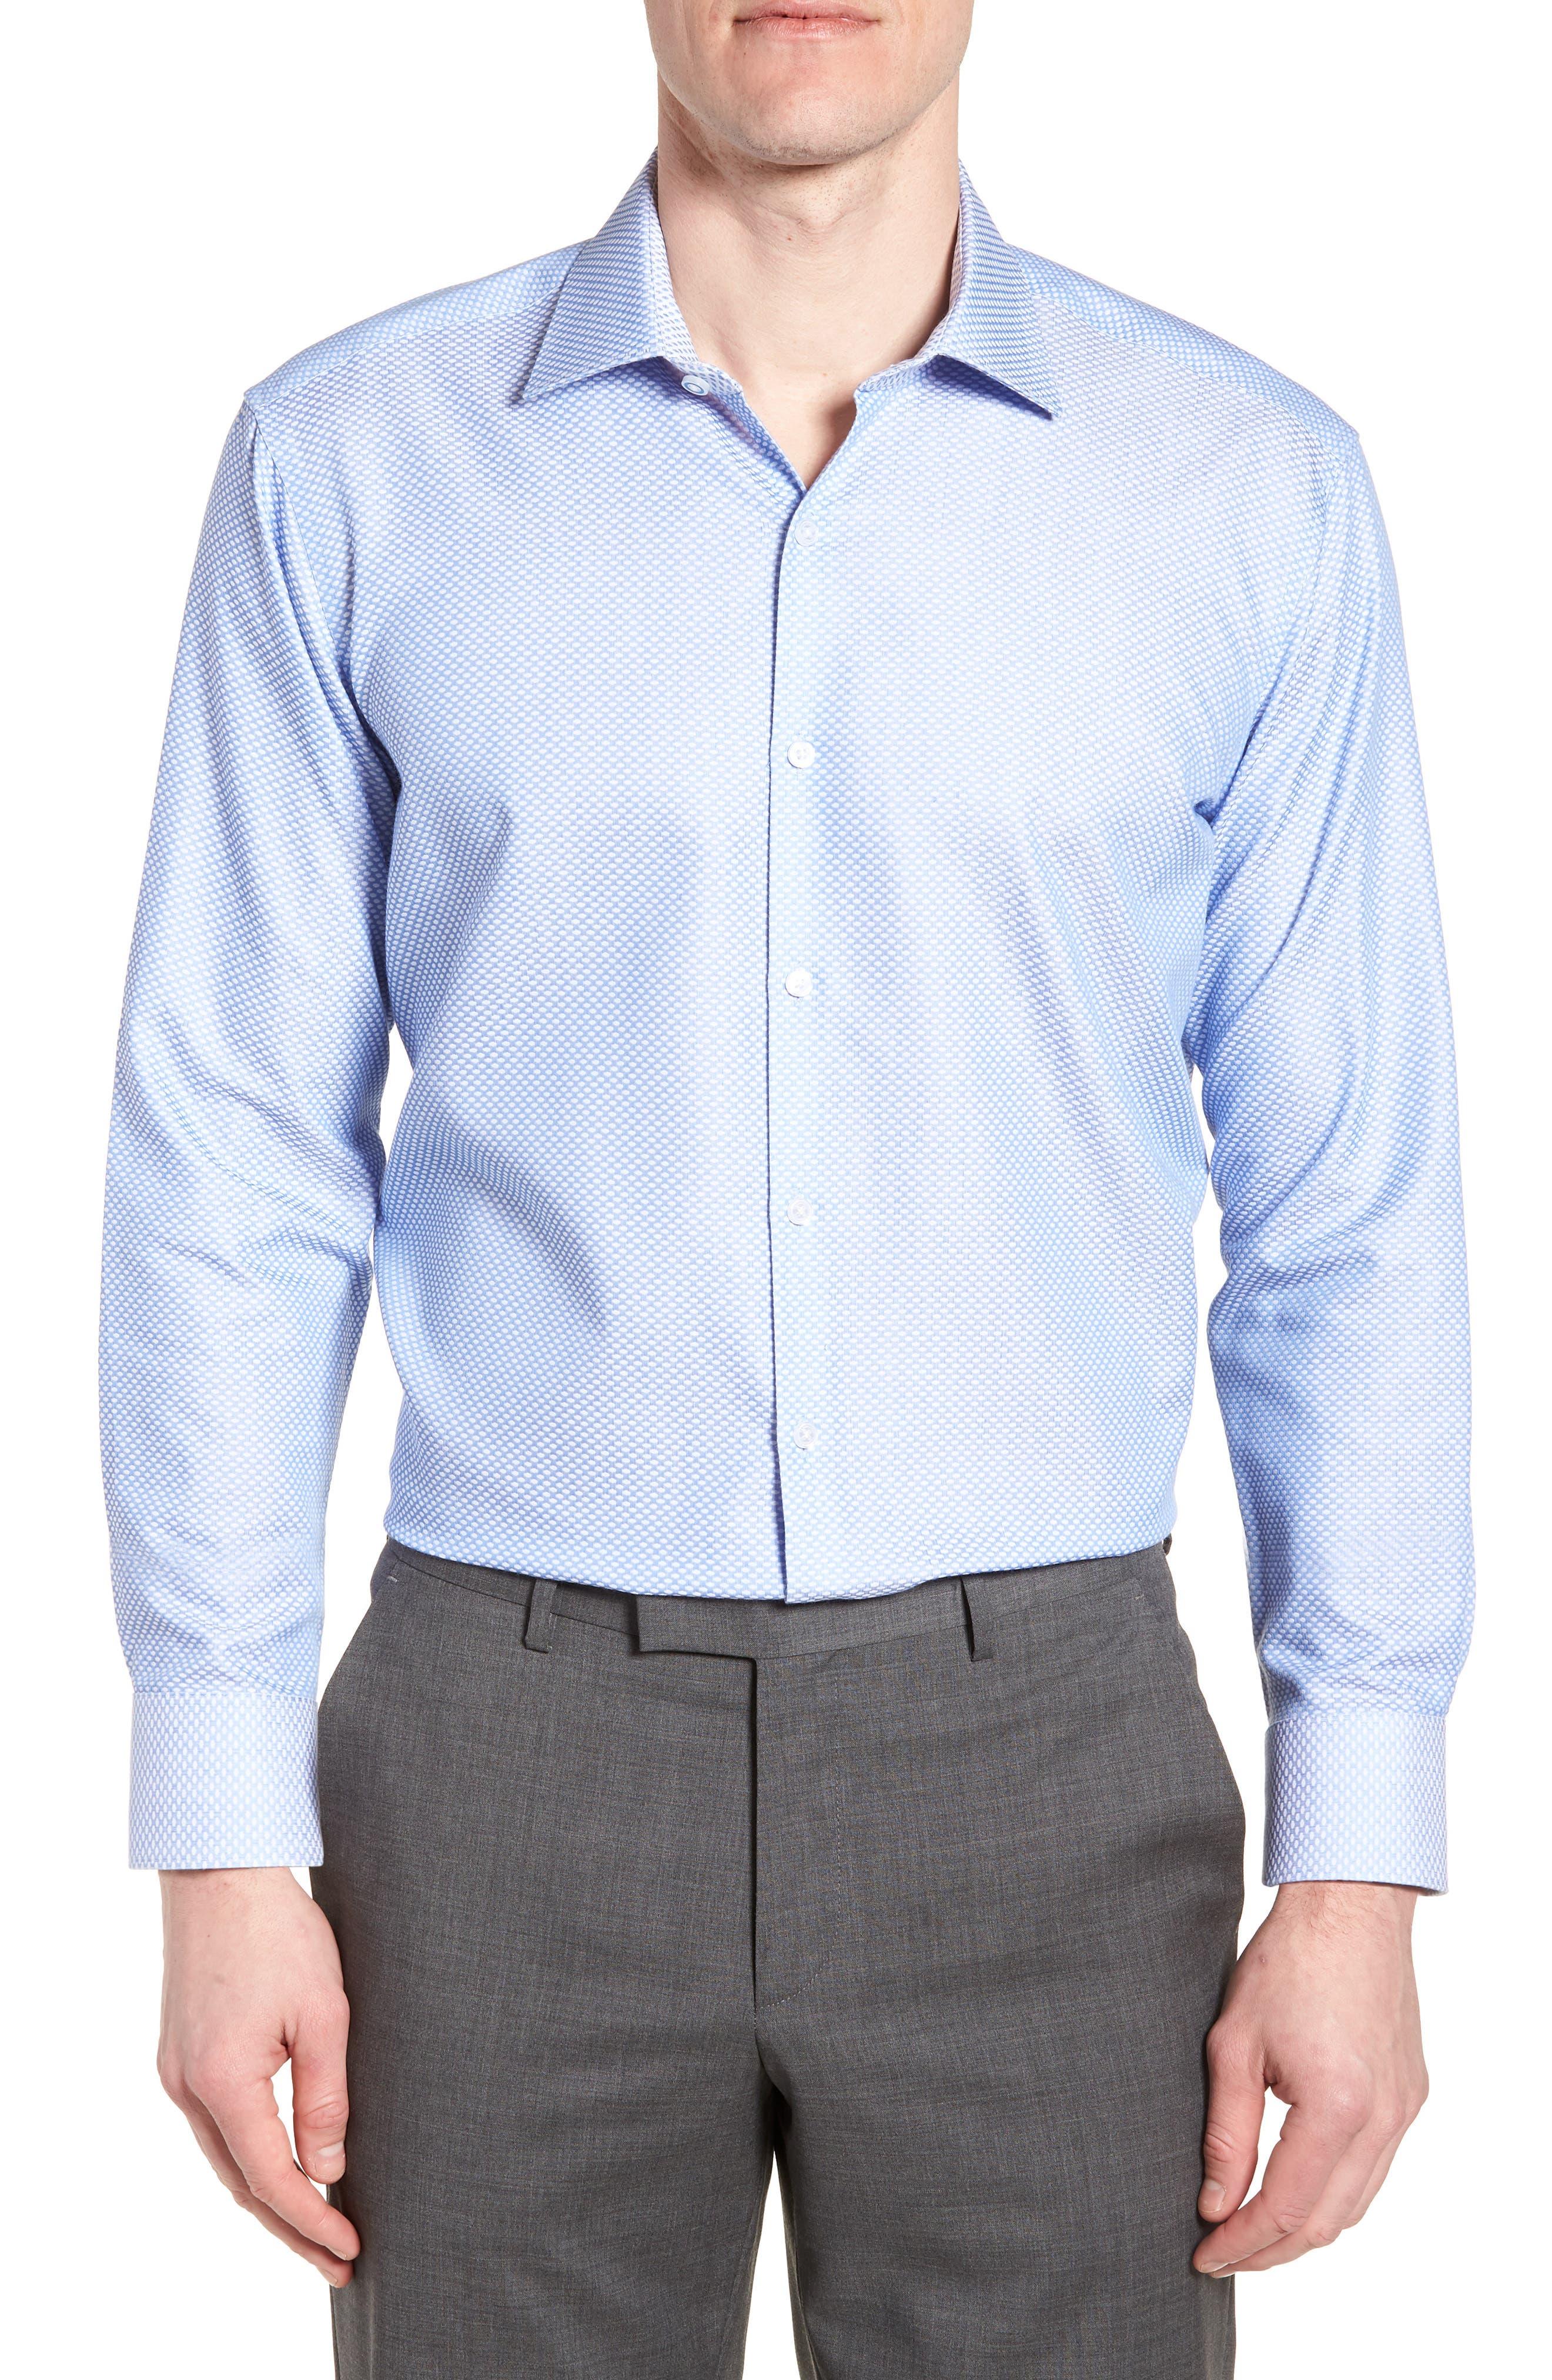 Holmes Trim Fit Dot Dress Shirt,                         Main,                         color, 450